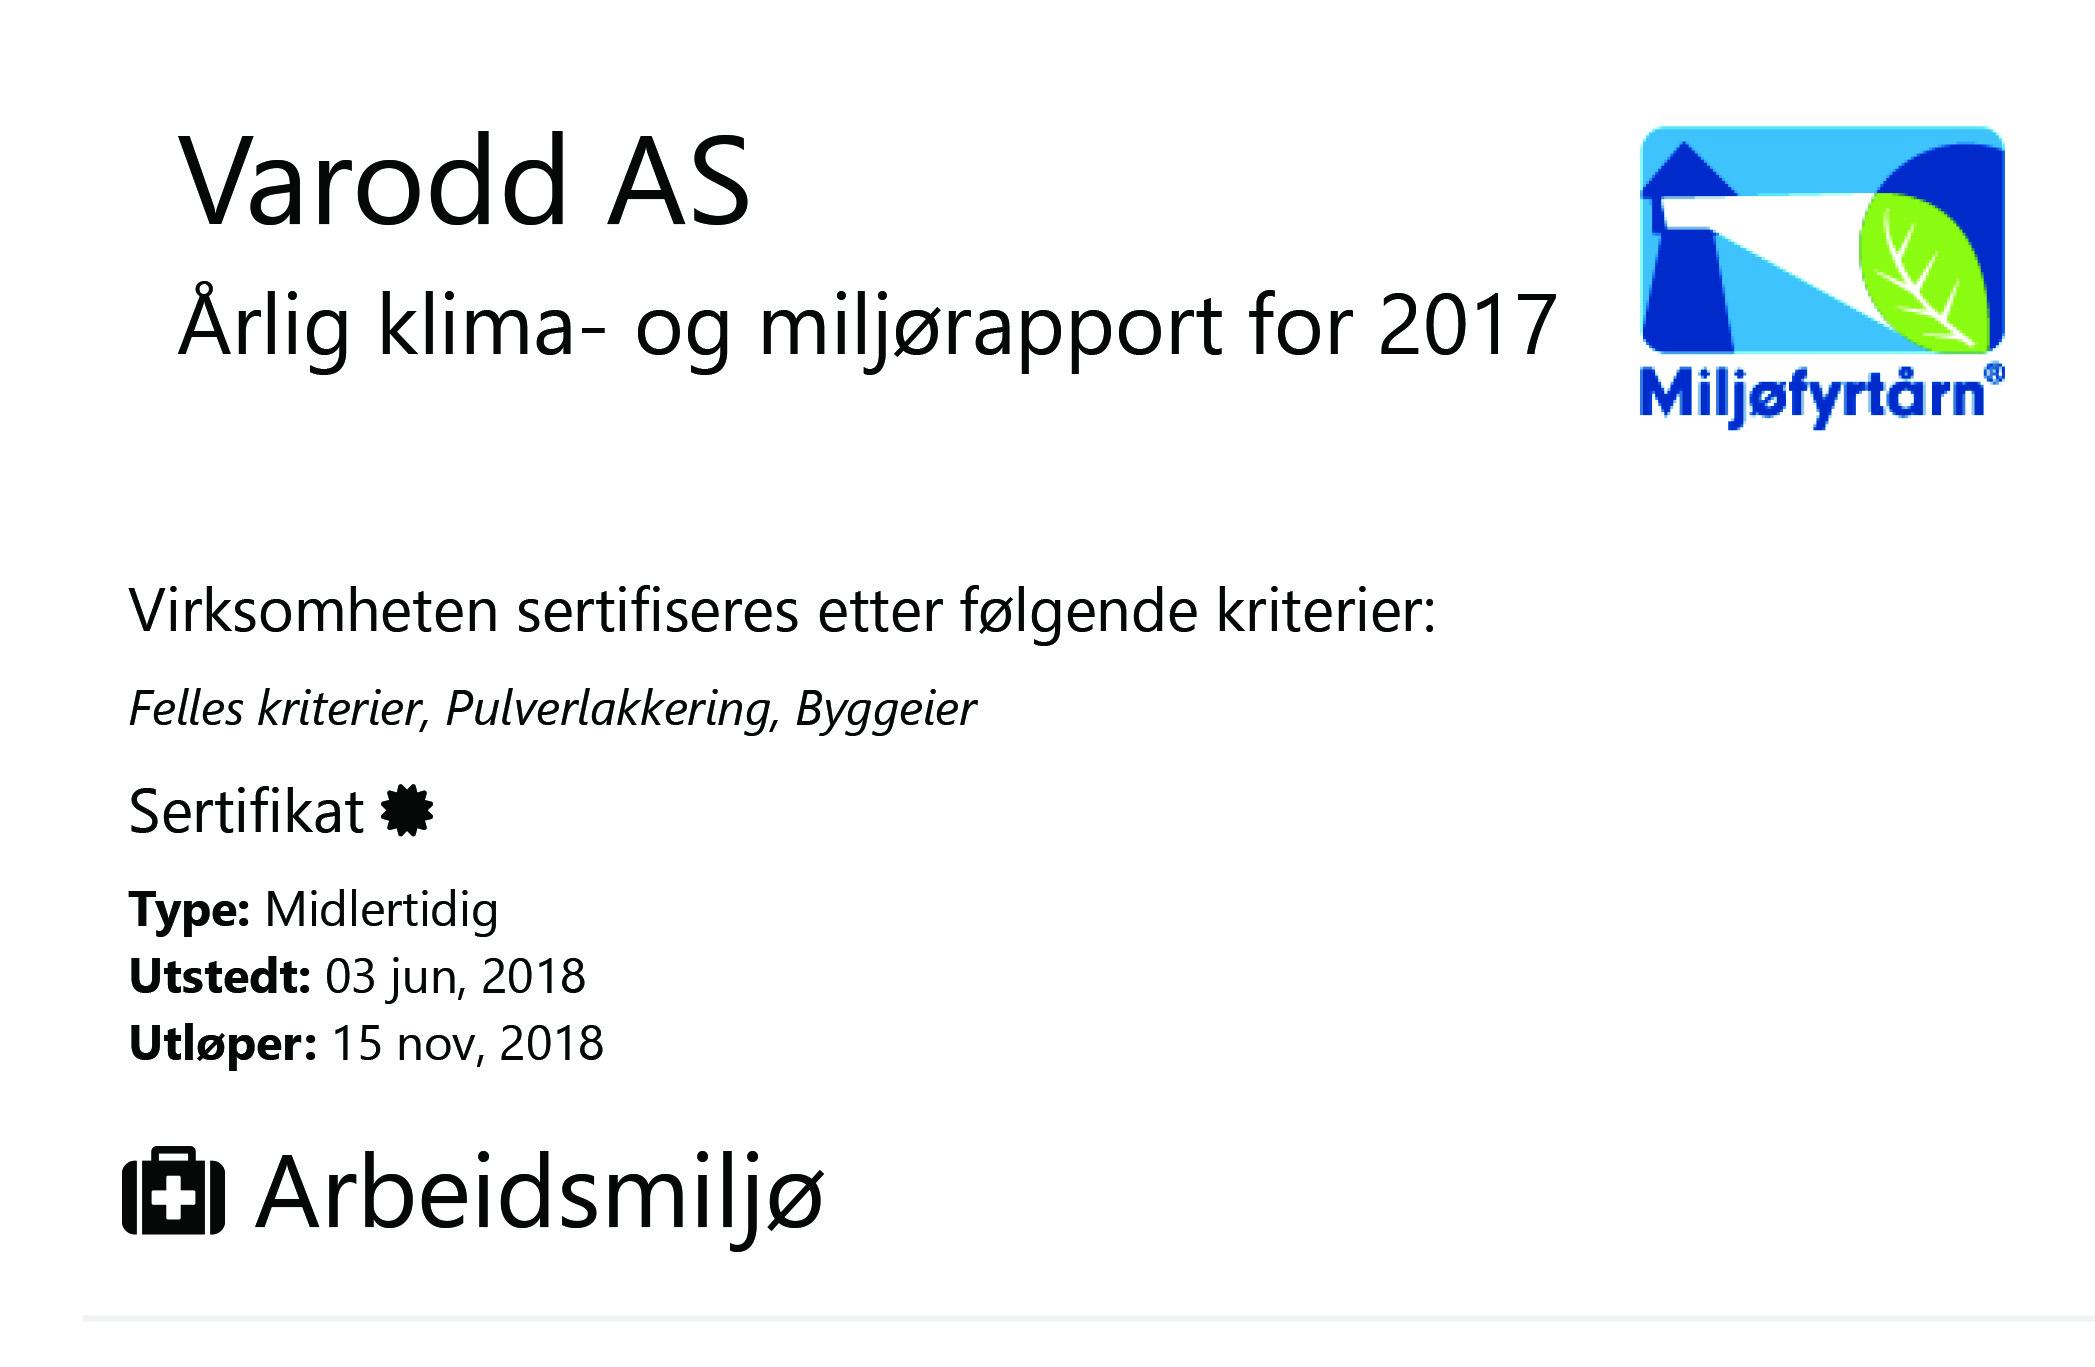 Miljørapport 2017 for Varodd